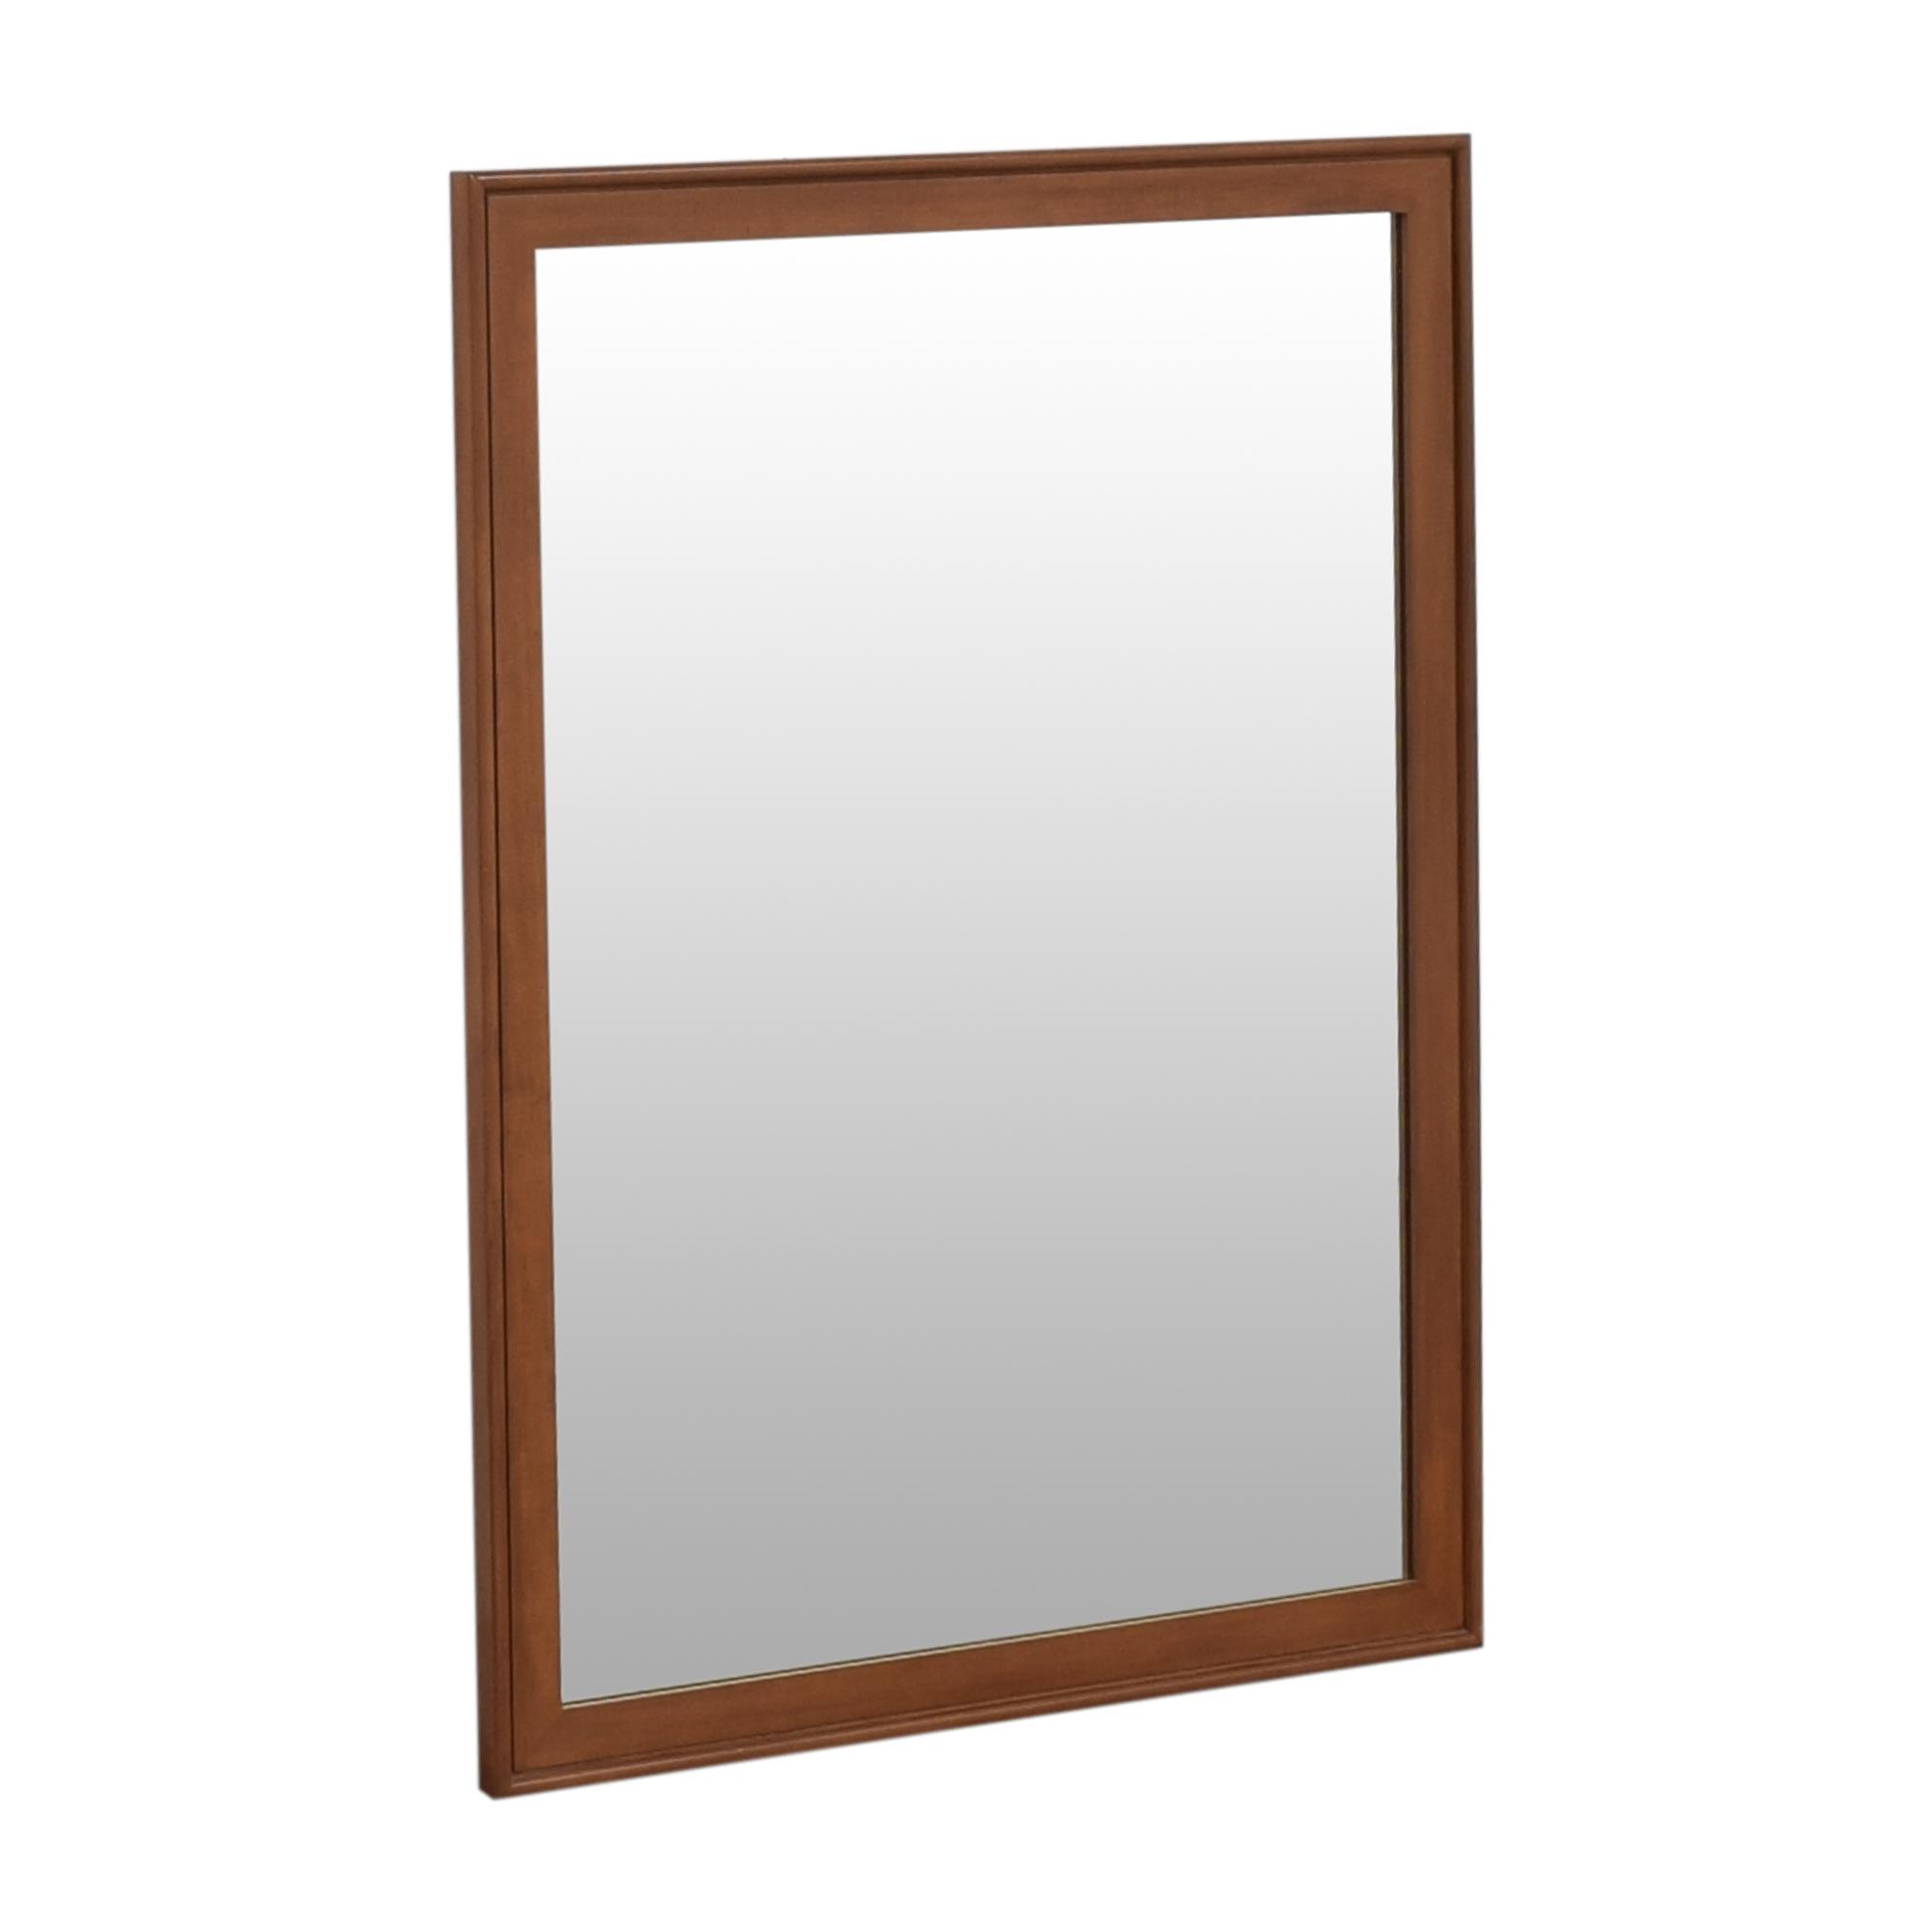 Urbangreen Furniture Mid Century Wall Mirror / Mirrors